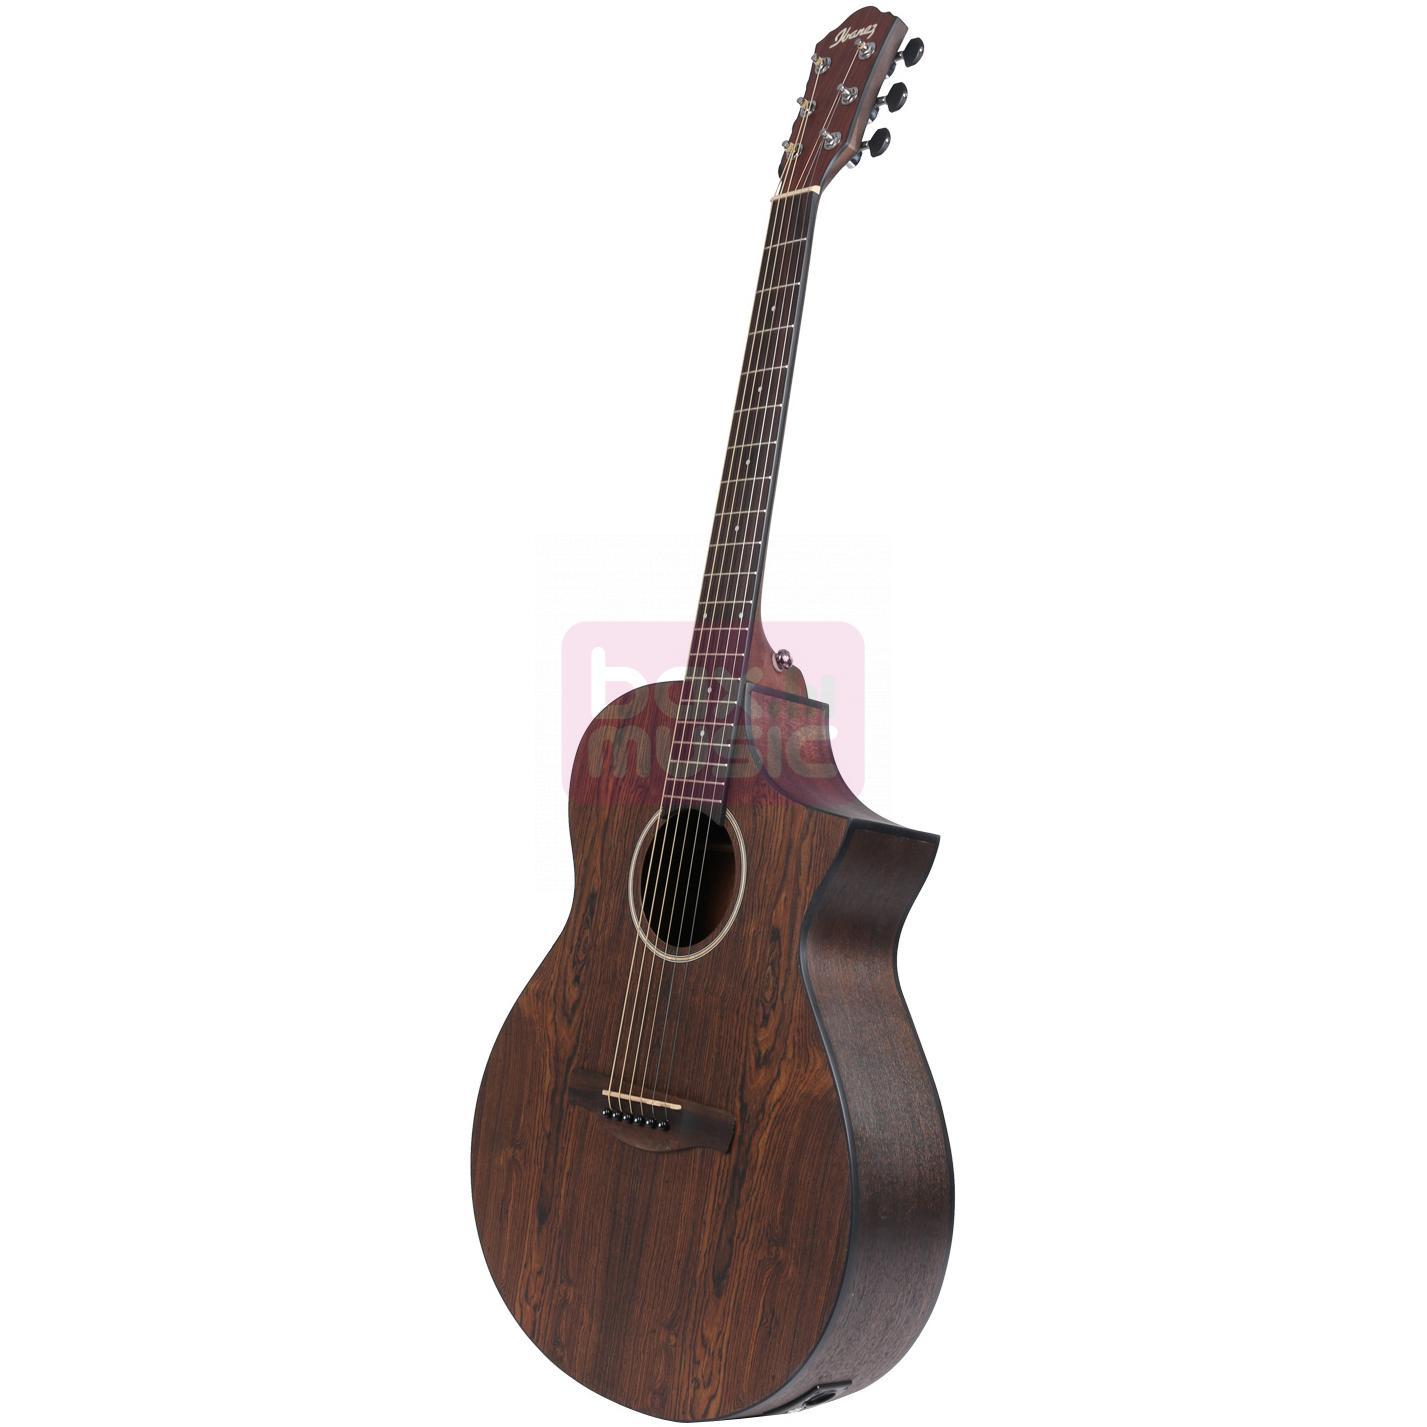 Ibanez AEWC31BC Open Pore Natural elektrisch-akoestische gitaar